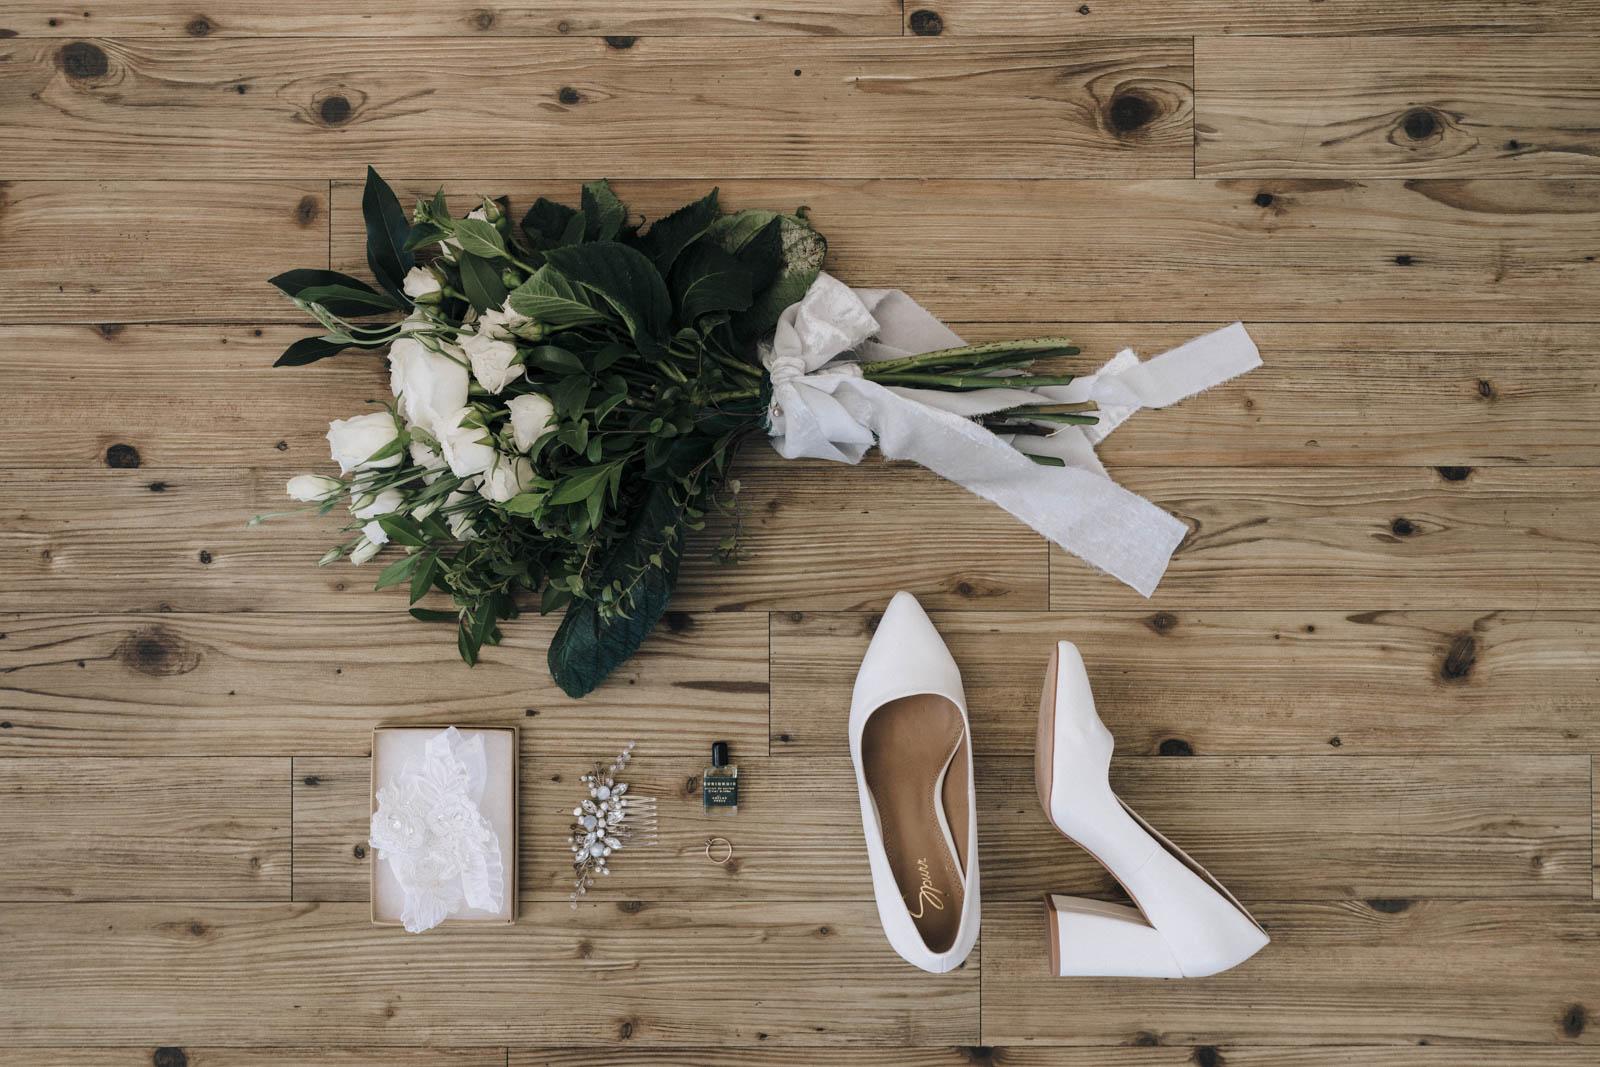 newfound-l-i-coromandel-wedding-photographer-1522-A9_02383